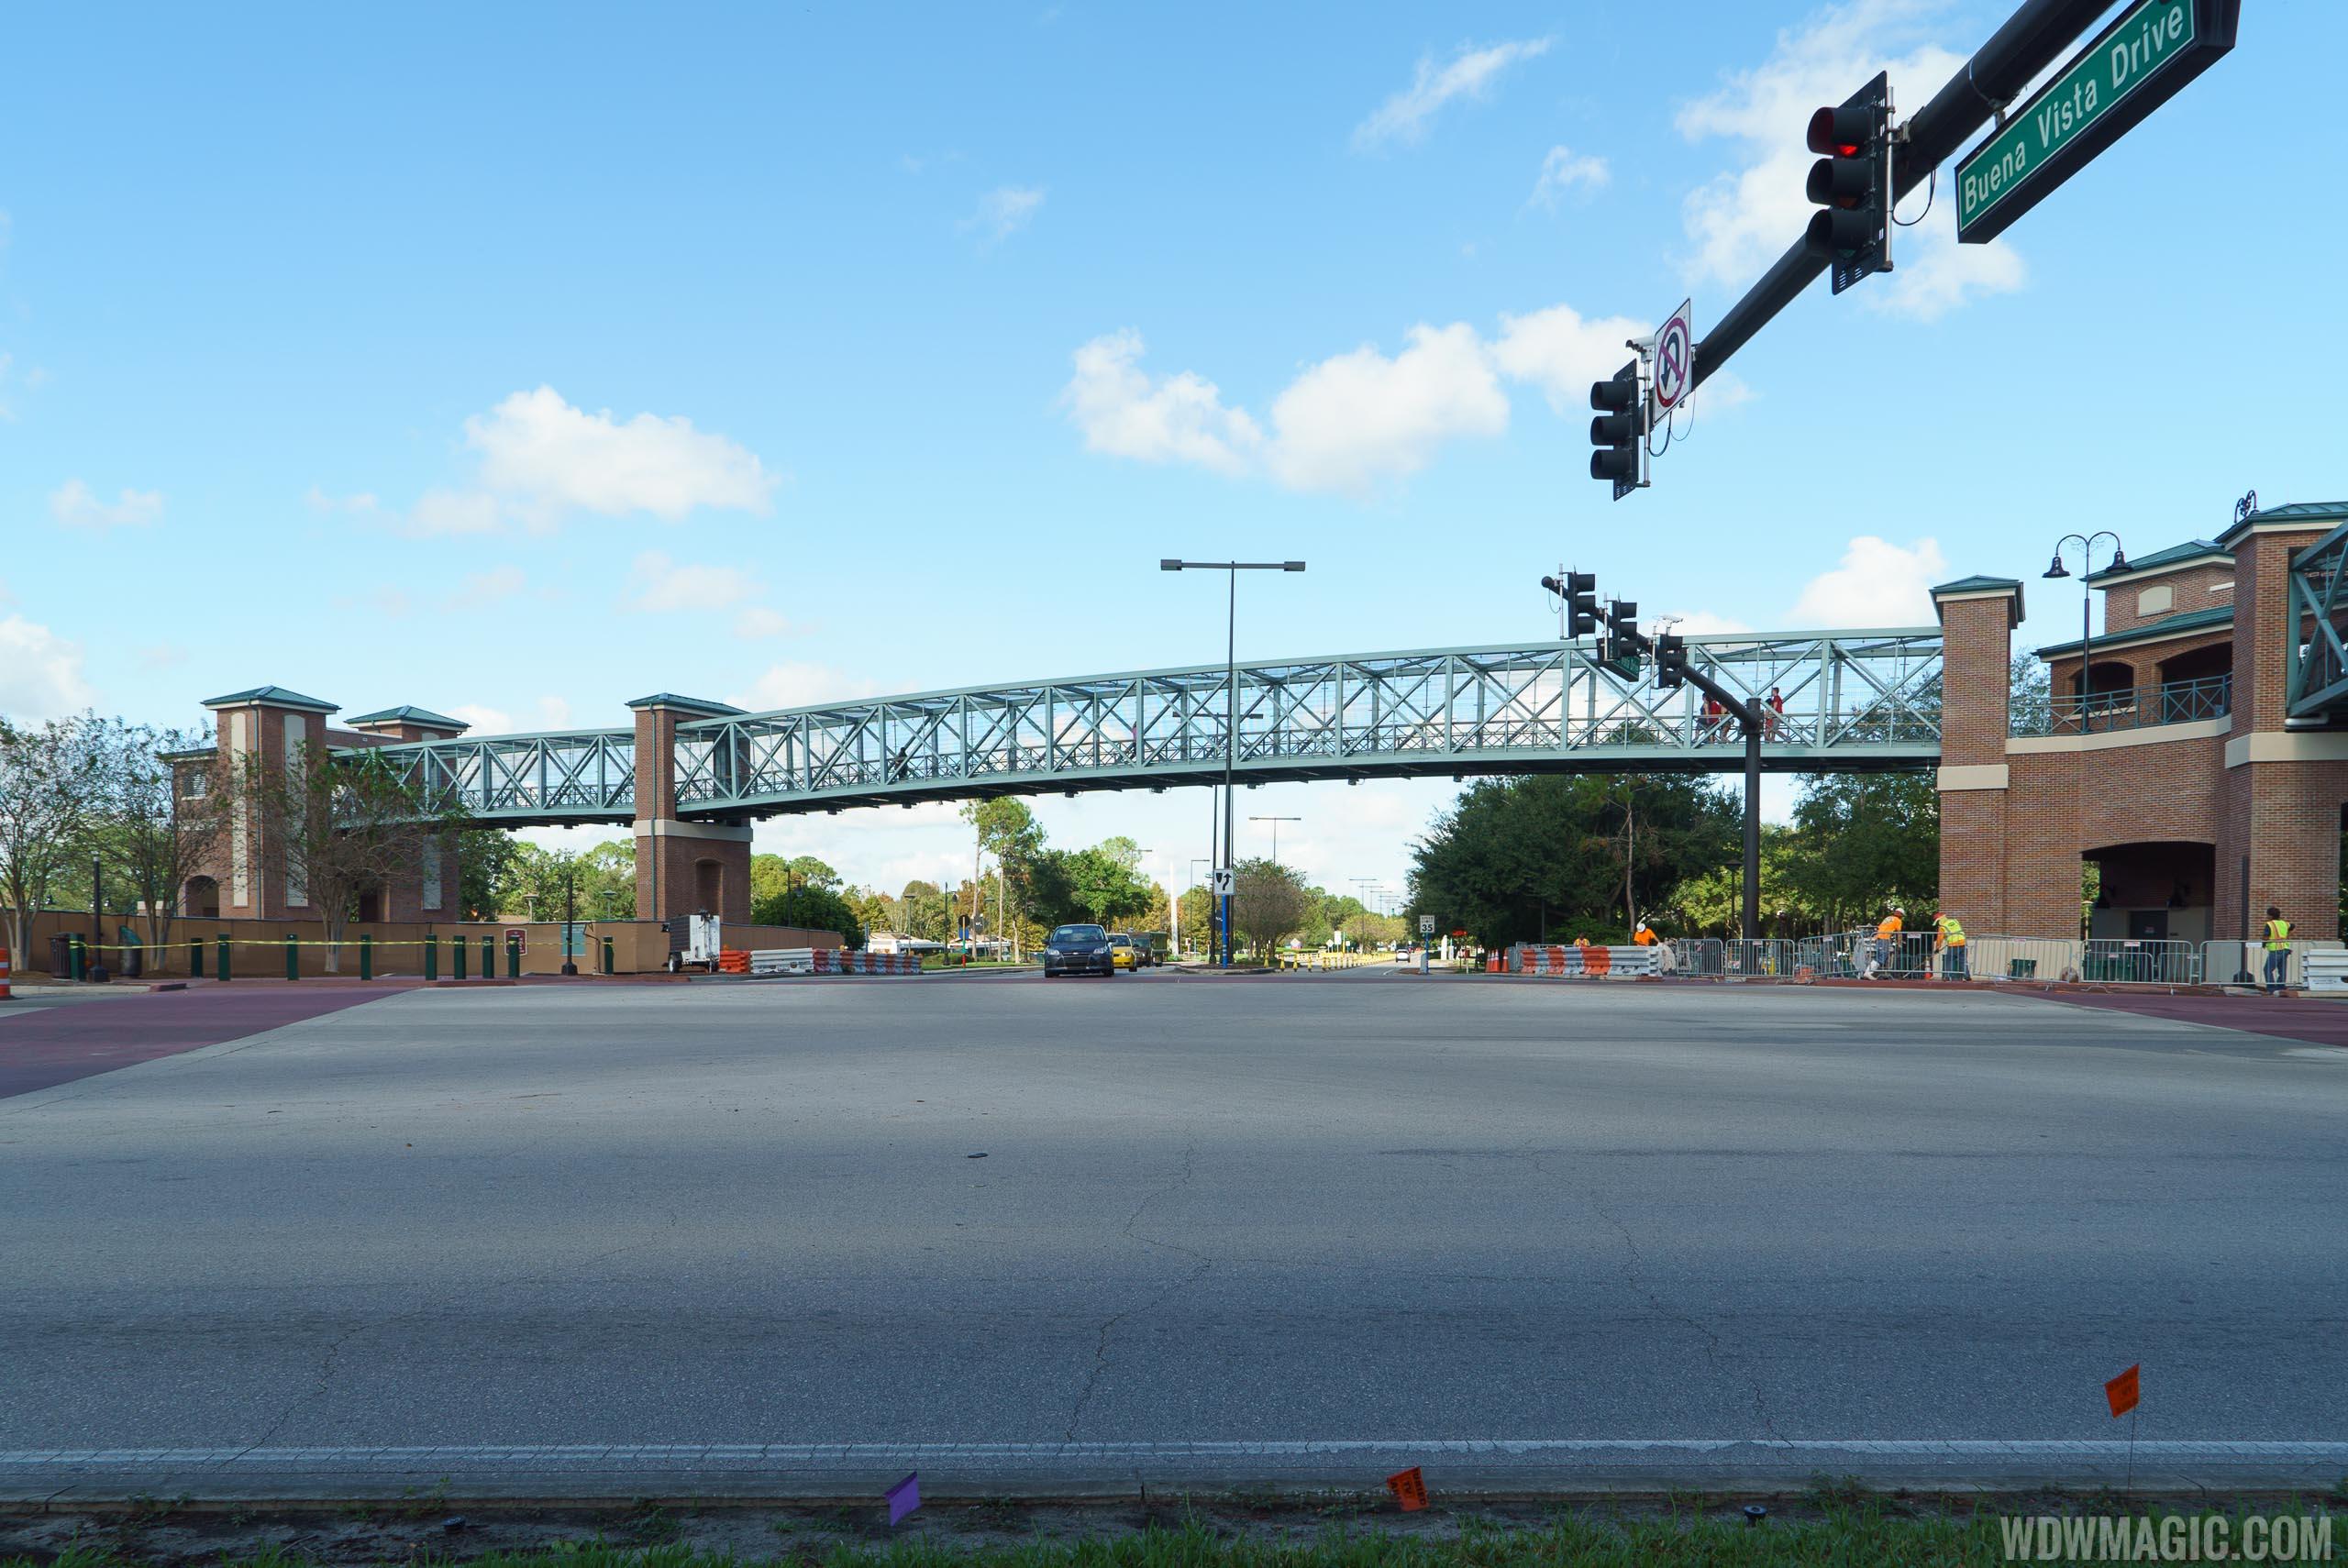 Second Disney Springs Buena Vista Drive pedestrian bridge completed